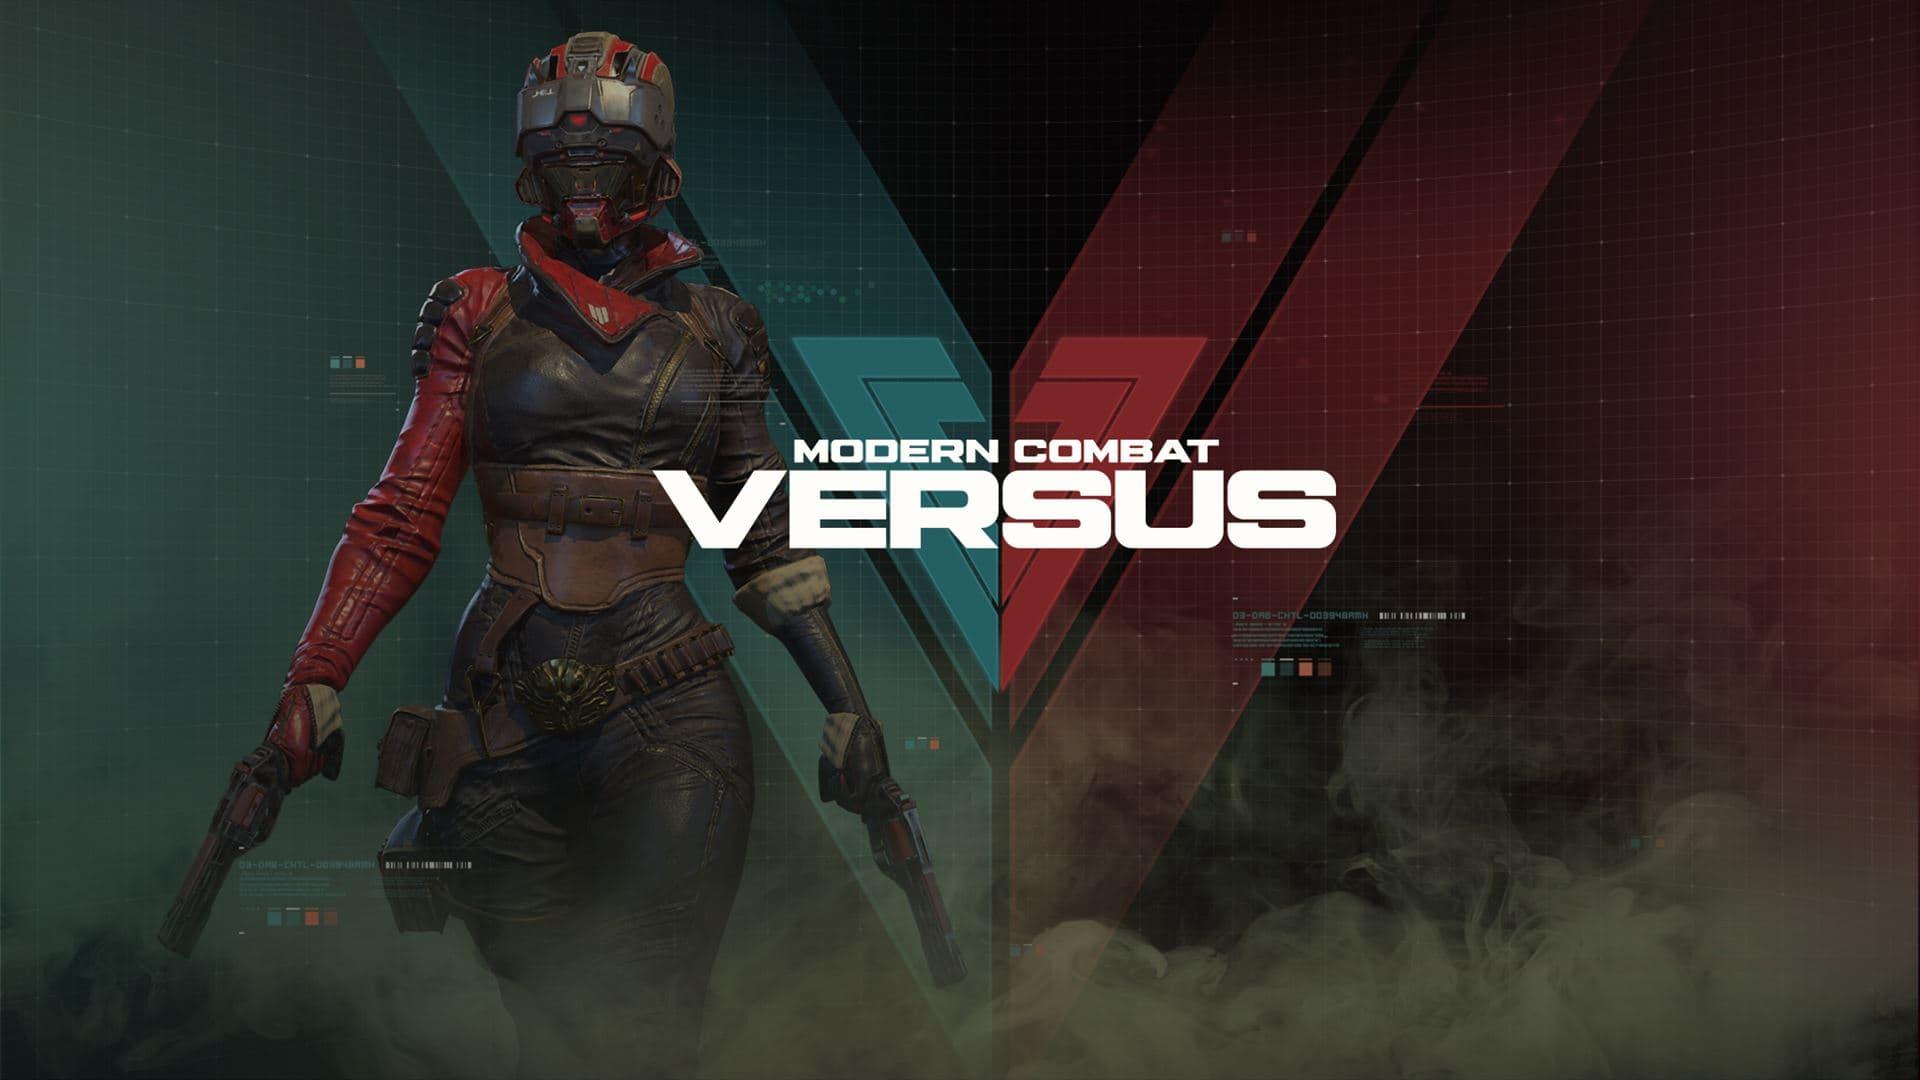 modern-combat-versus-android-ios-pre-registro-tap-tap Modern Combat Versus: serviço de download Tap Tap oferece pré-registro do game